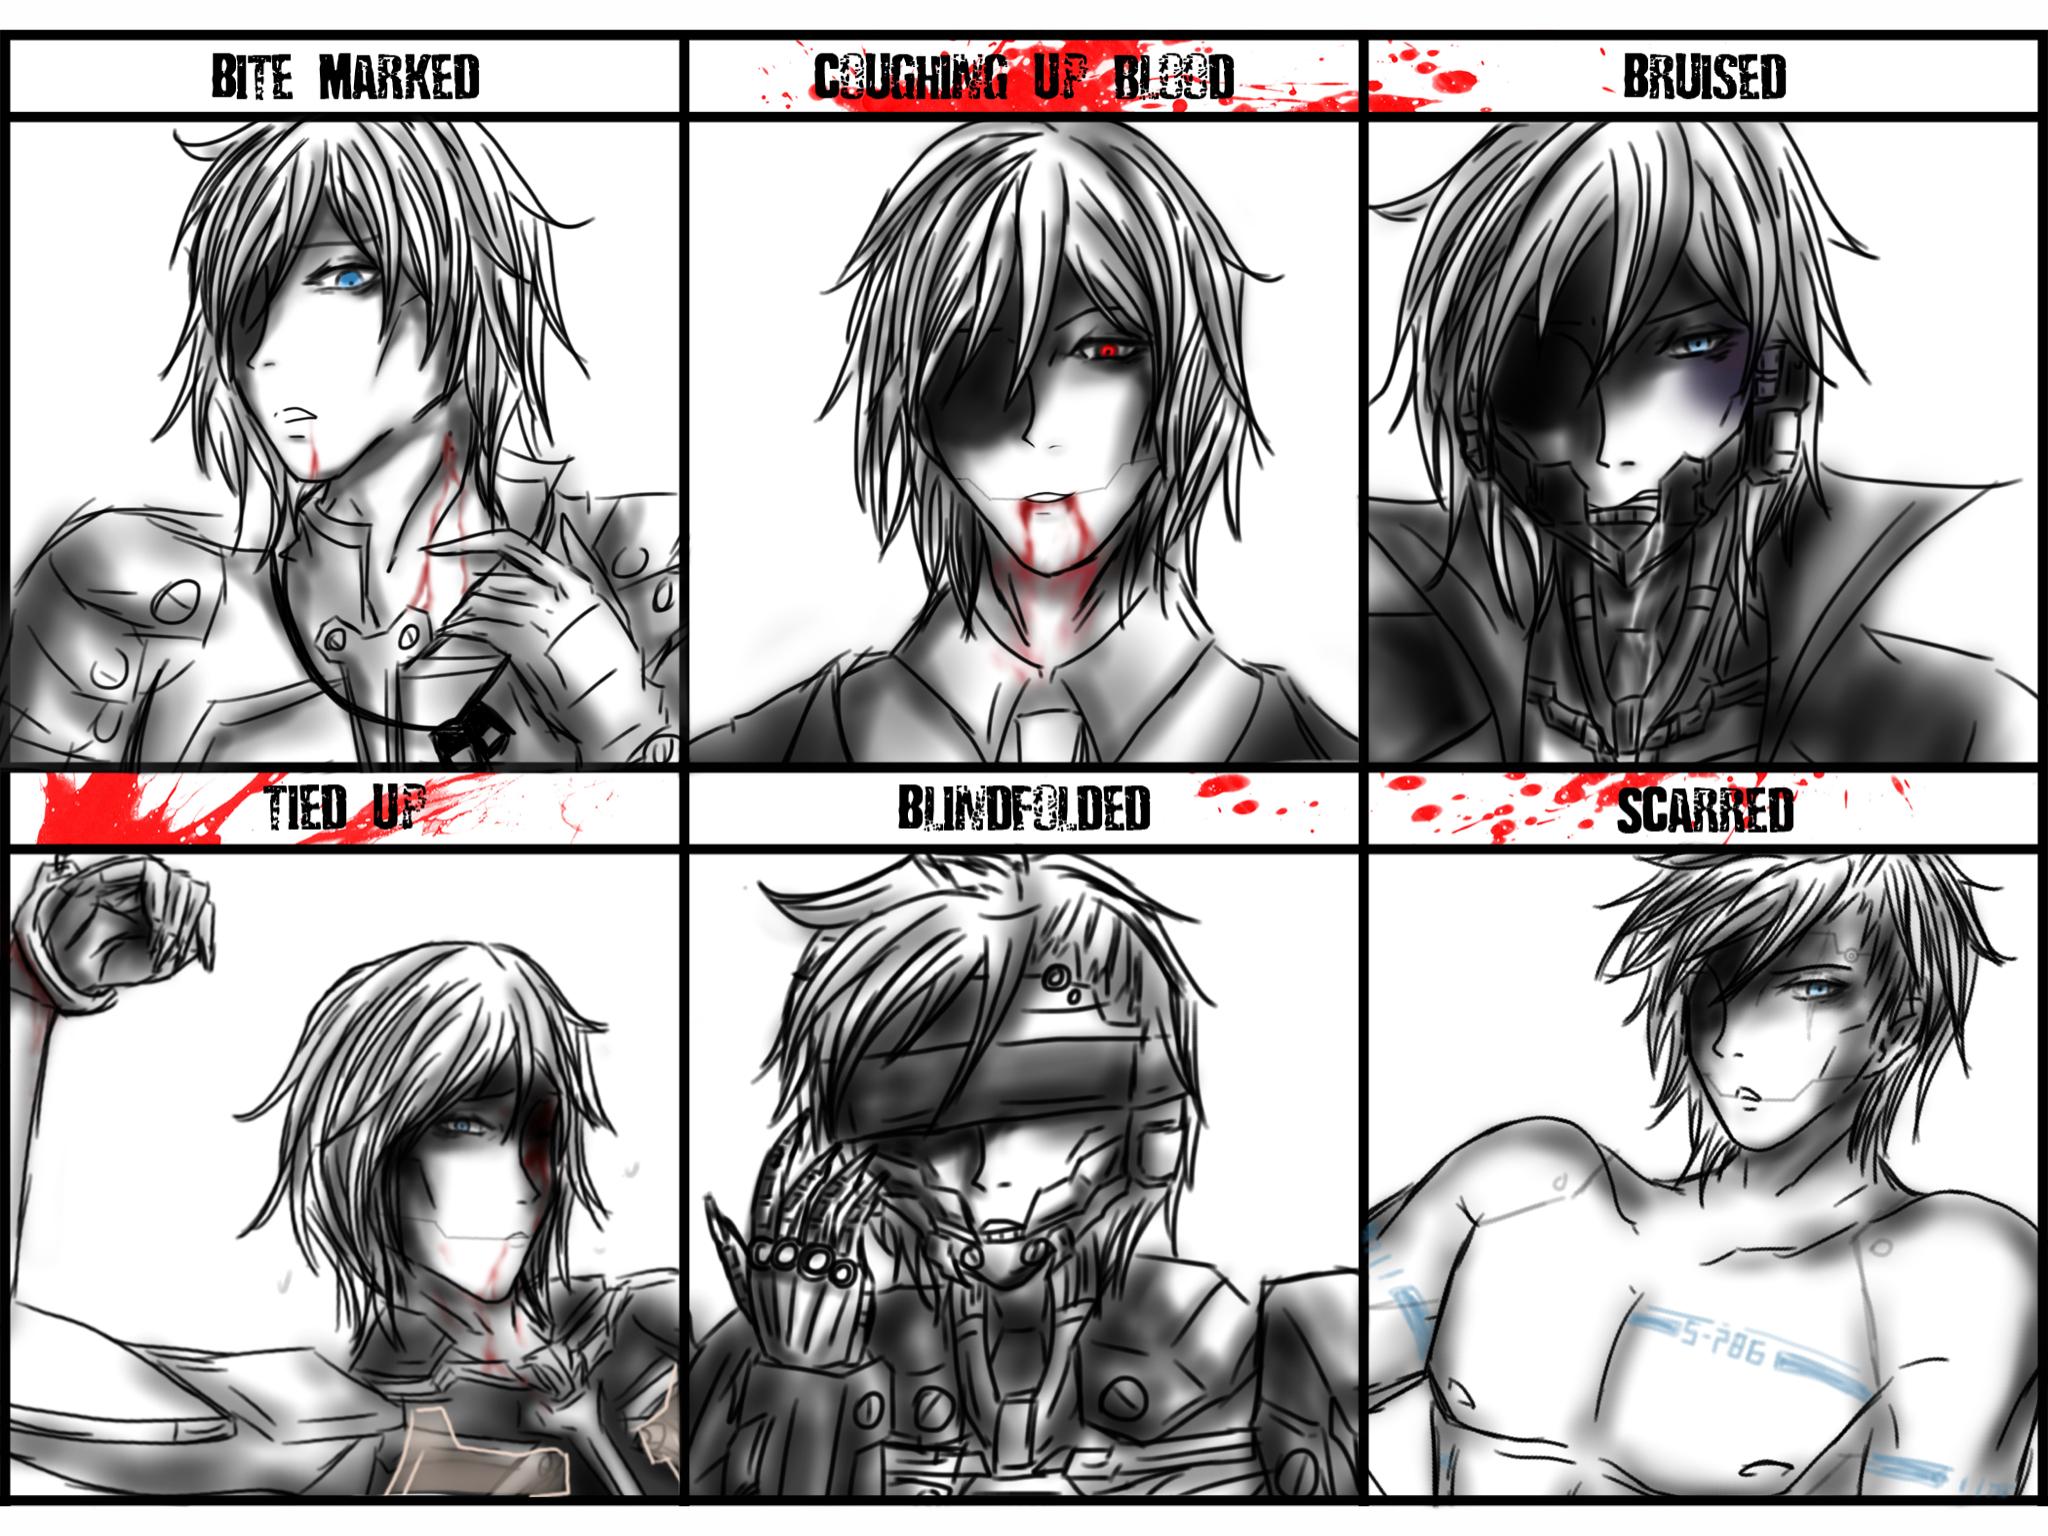 Raiden - Character abuse meme by DavidRiki